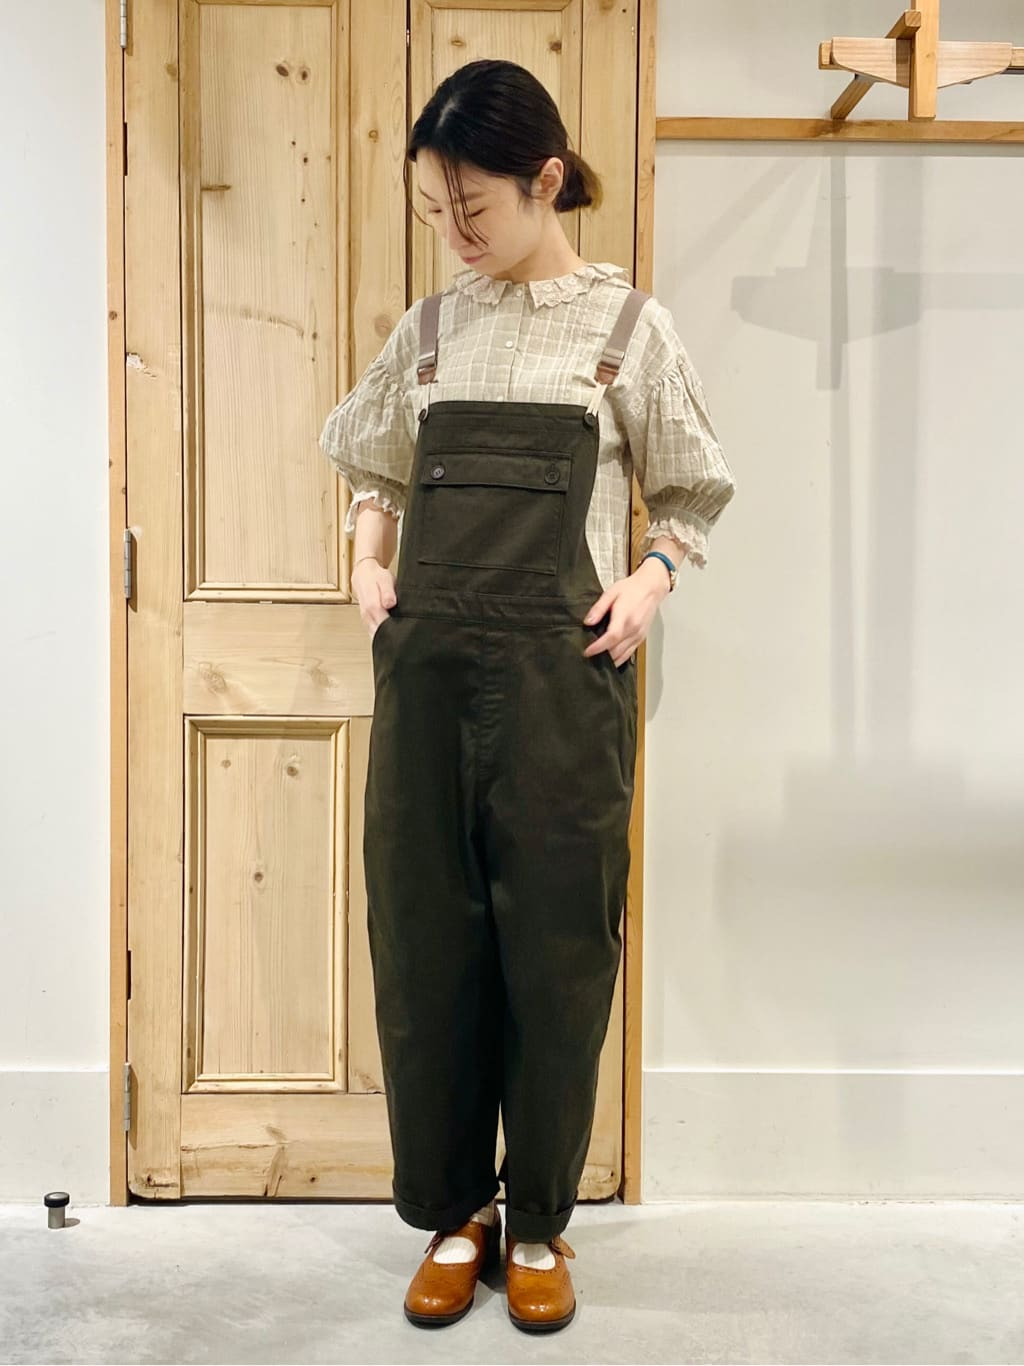 Malle chambre de charme 調布パルコ 身長:162cm 2021.08.18